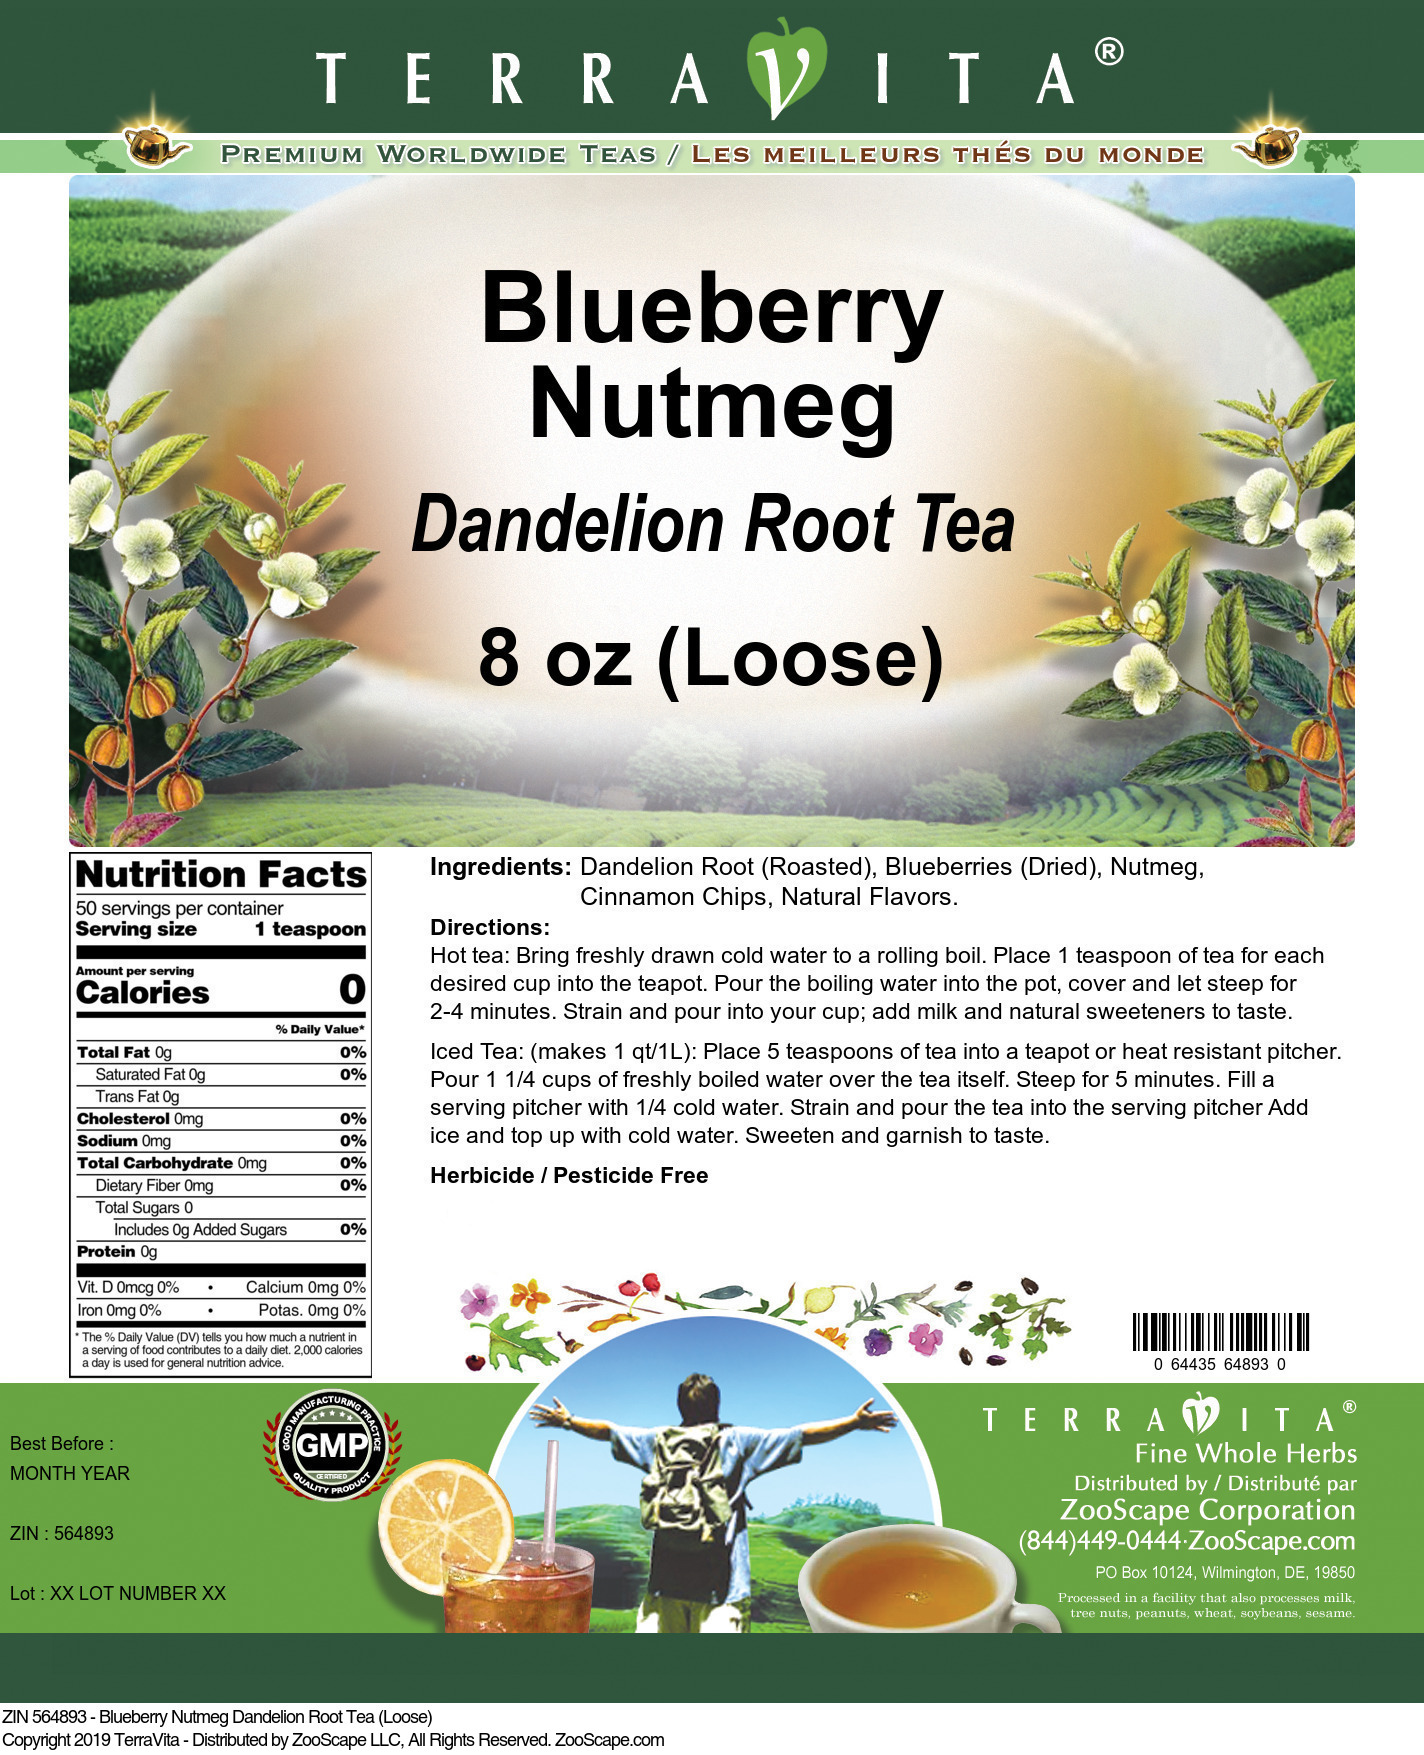 Blueberry Nutmeg Dandelion Root Tea (Loose)